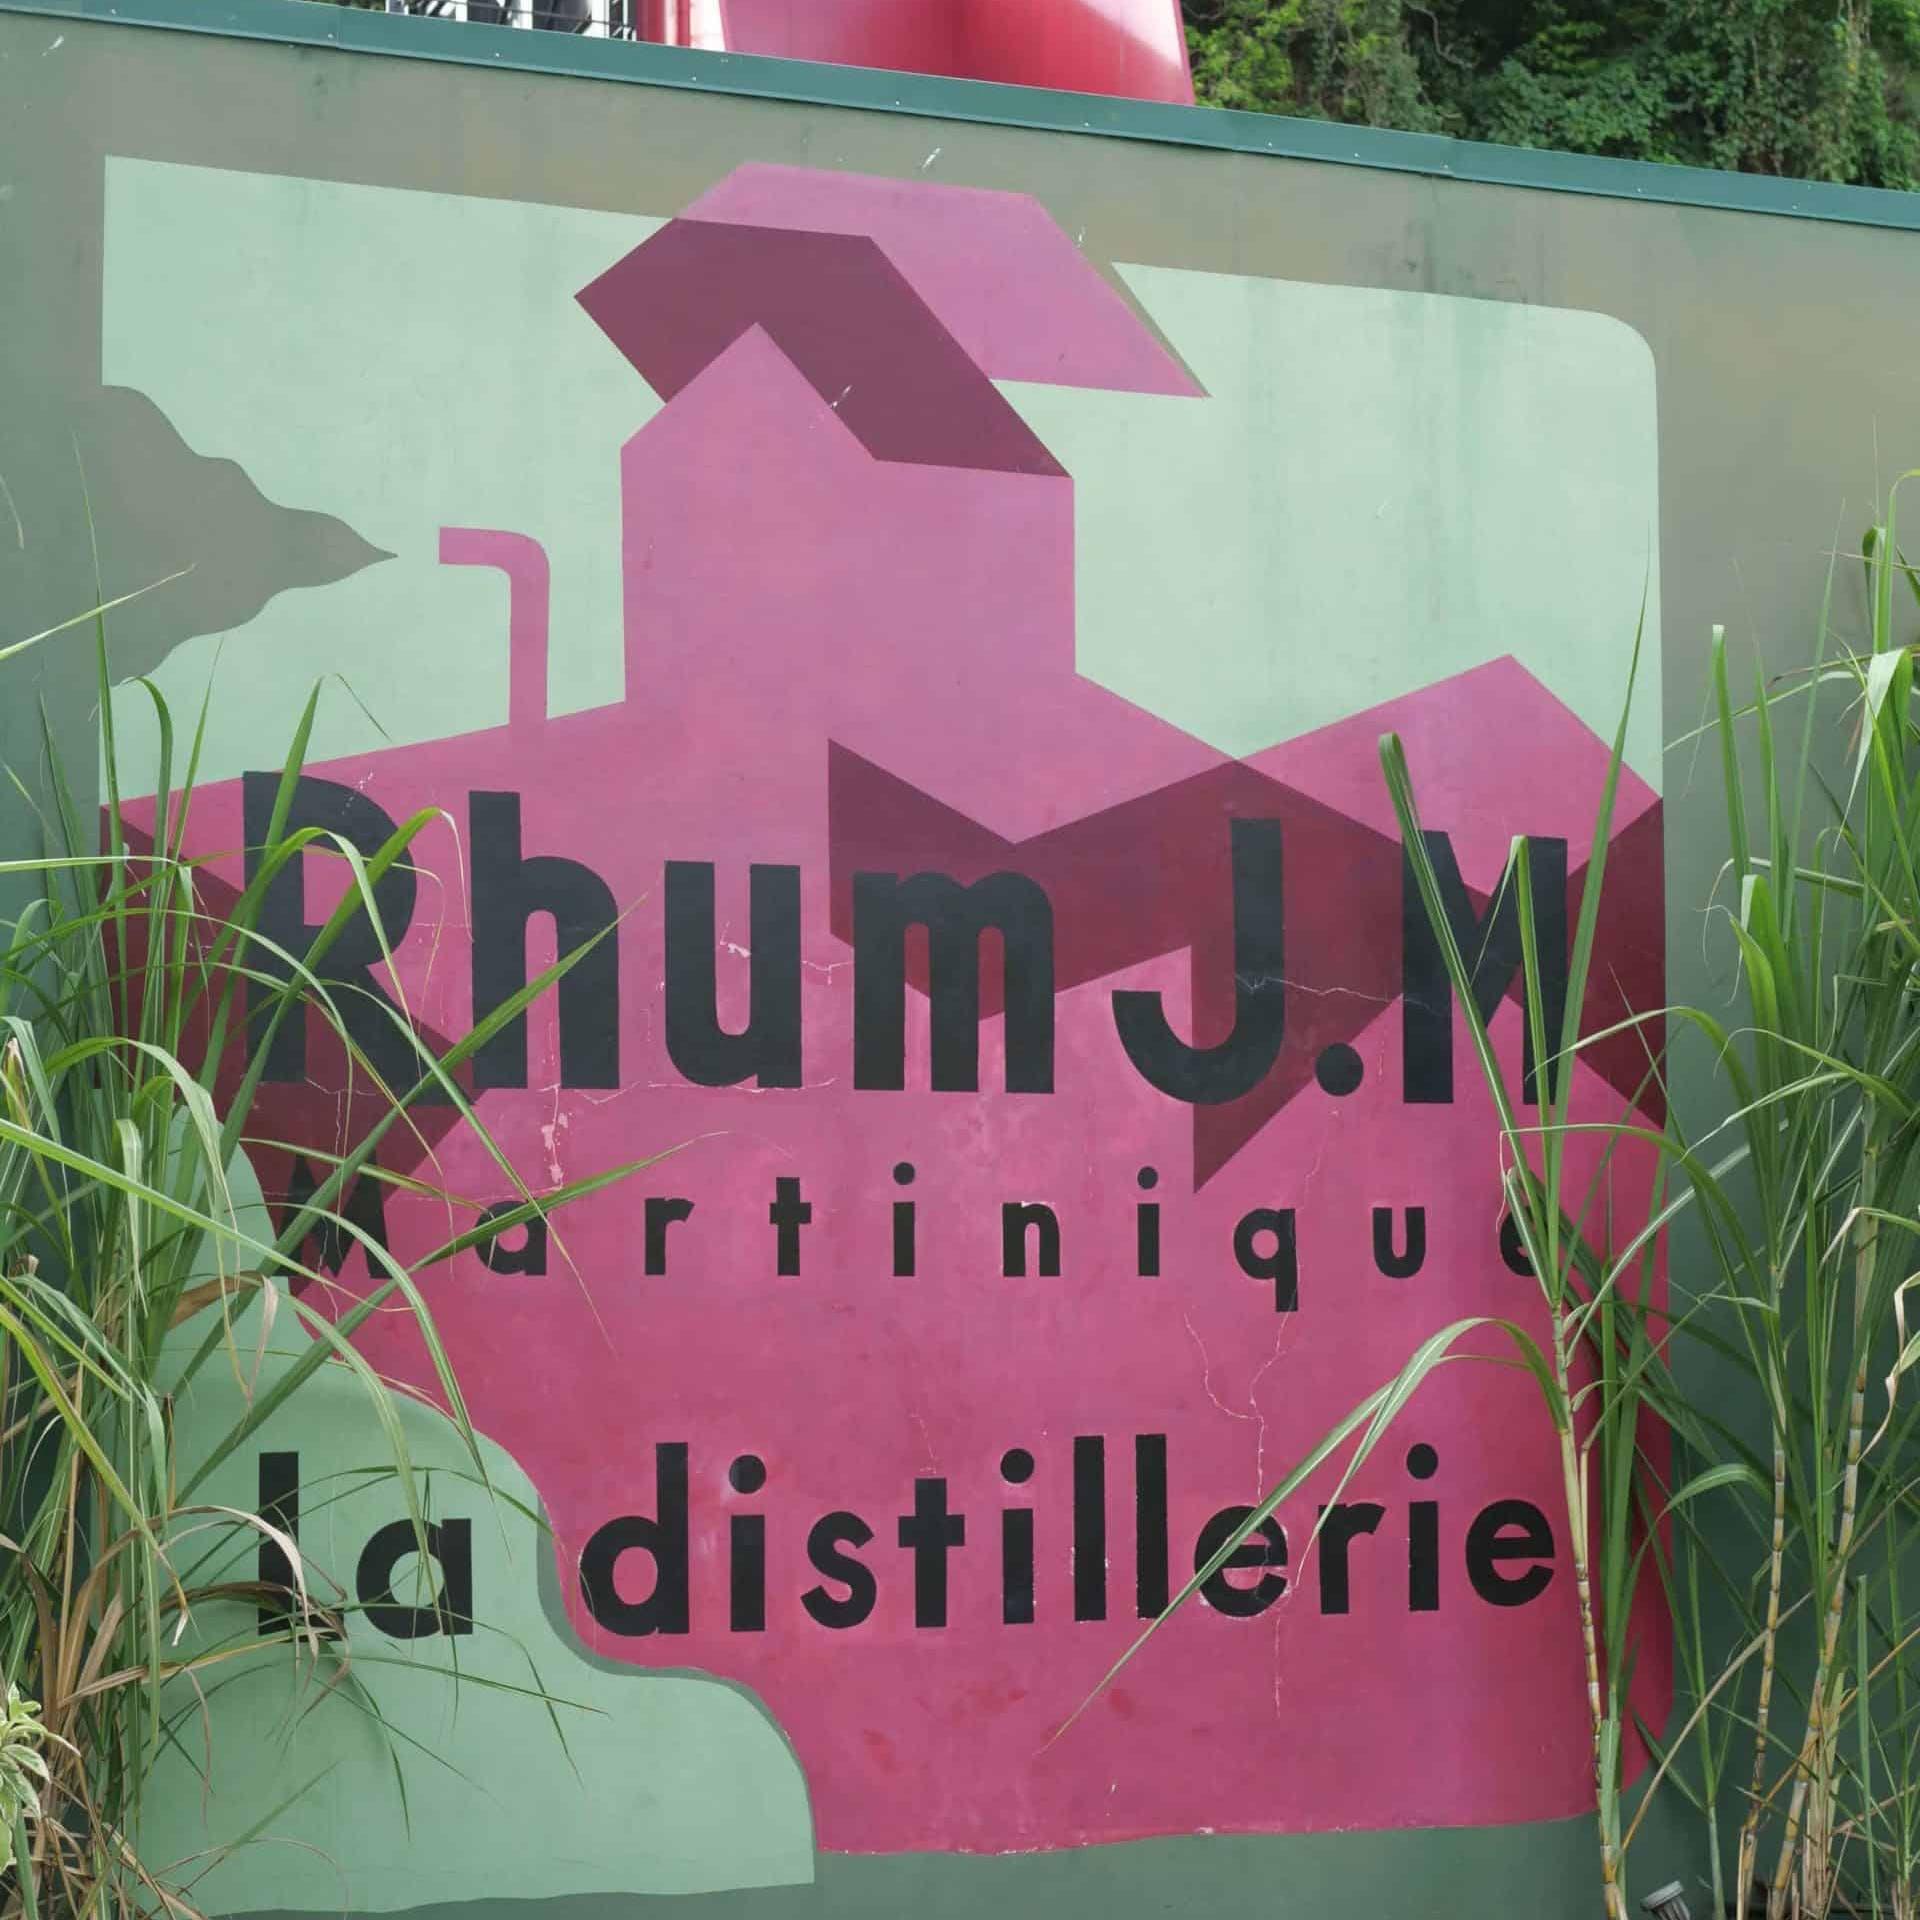 Distillerie JM